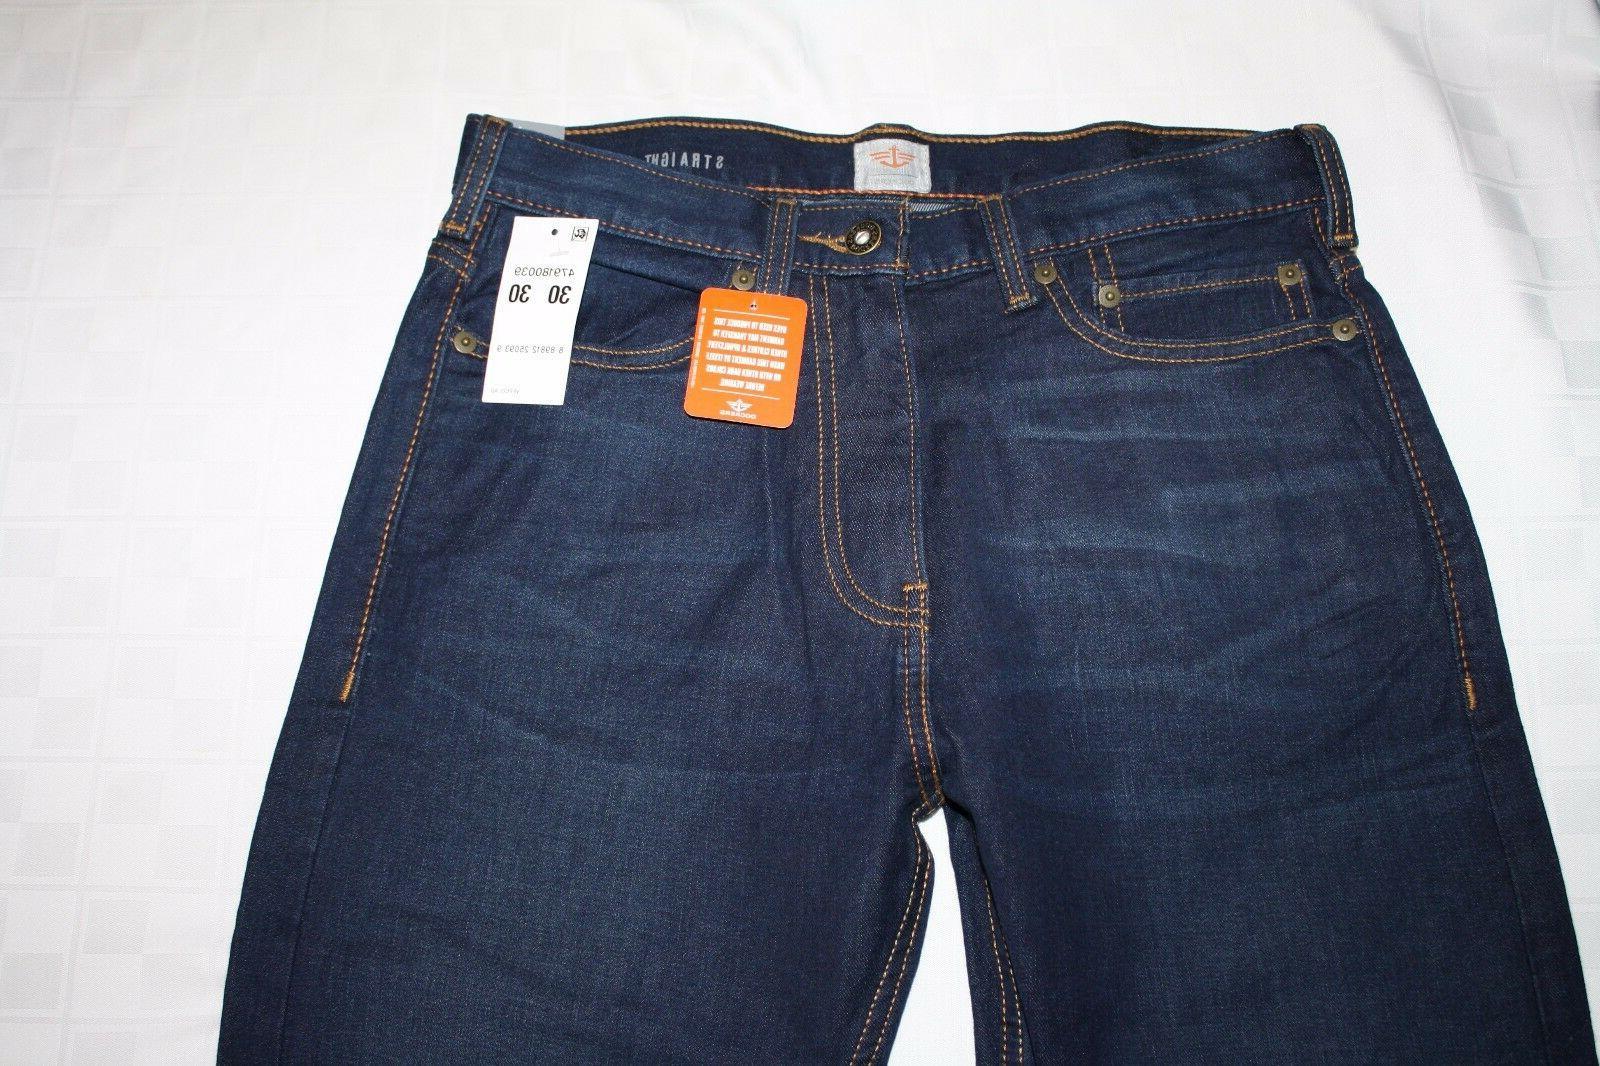 Distressed DOCKERS 5-Pocket Straight Fit Men's Dark Blue Jea